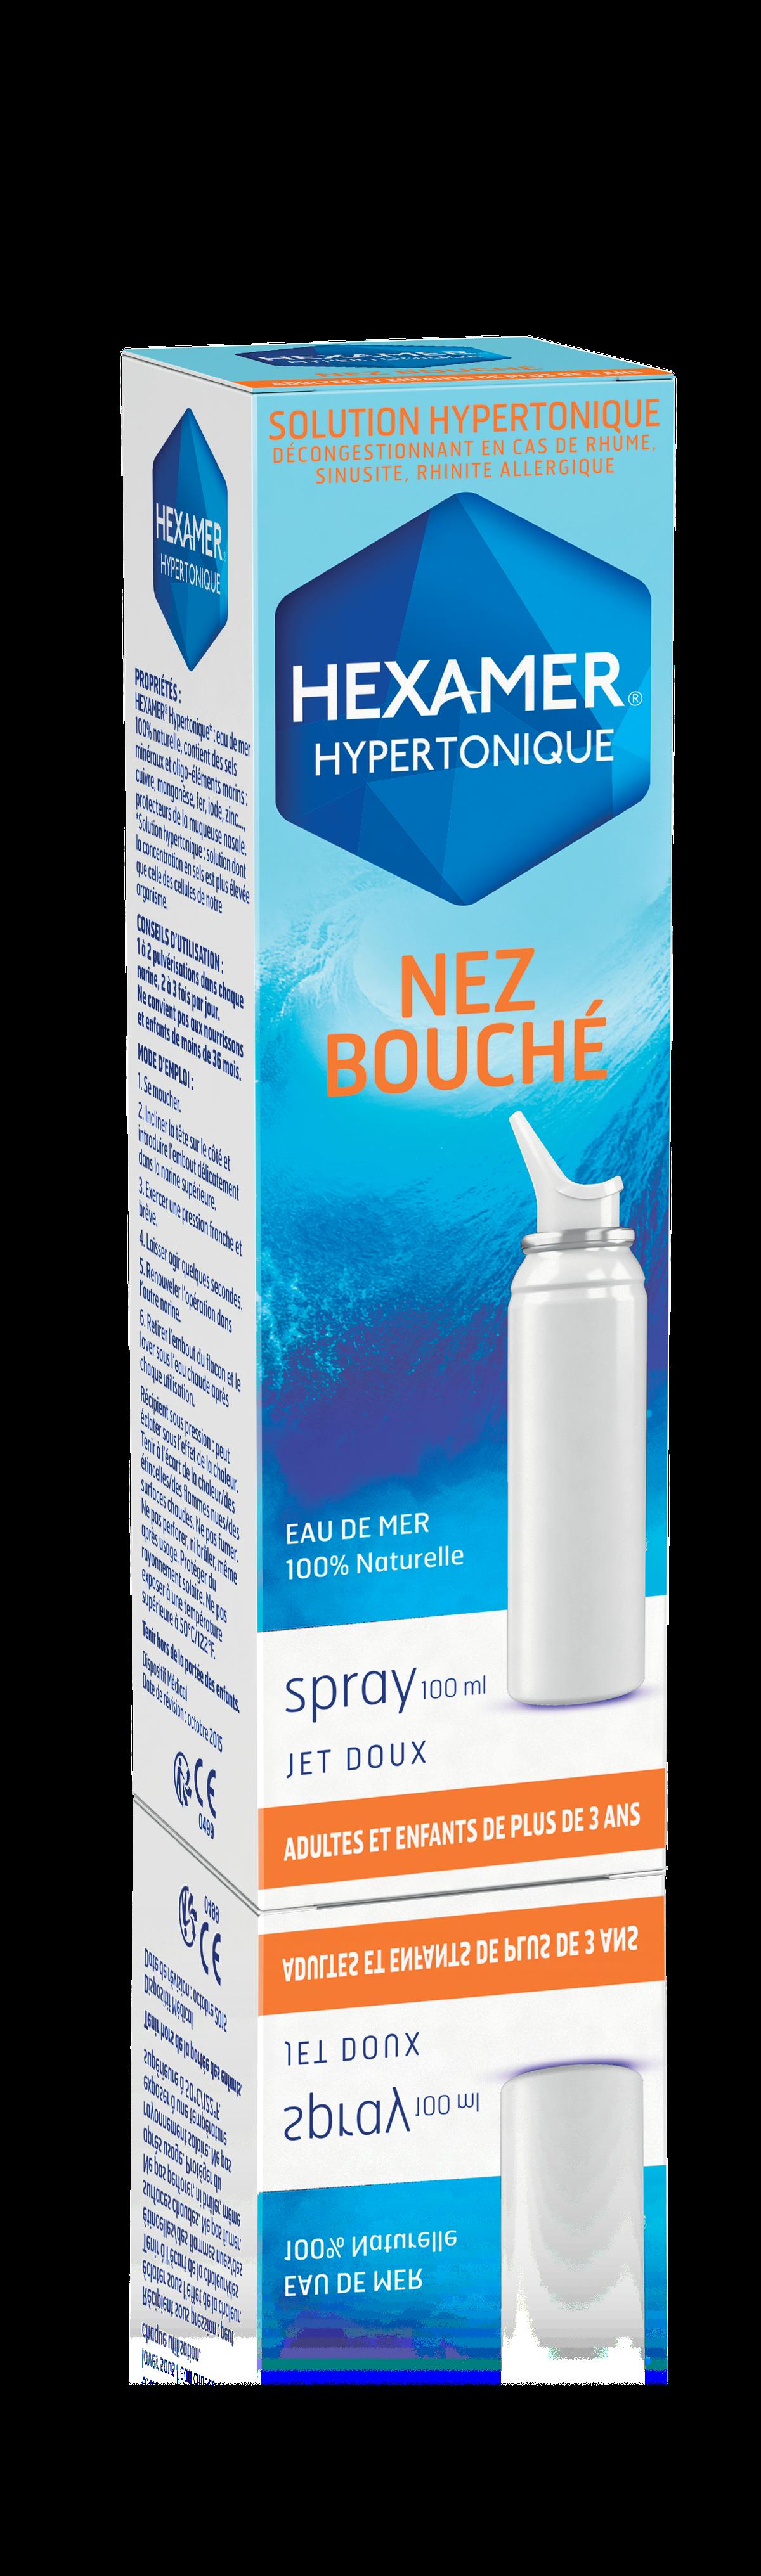 HEXAMER Hypertonique nez bouché spray nasal 100 ml